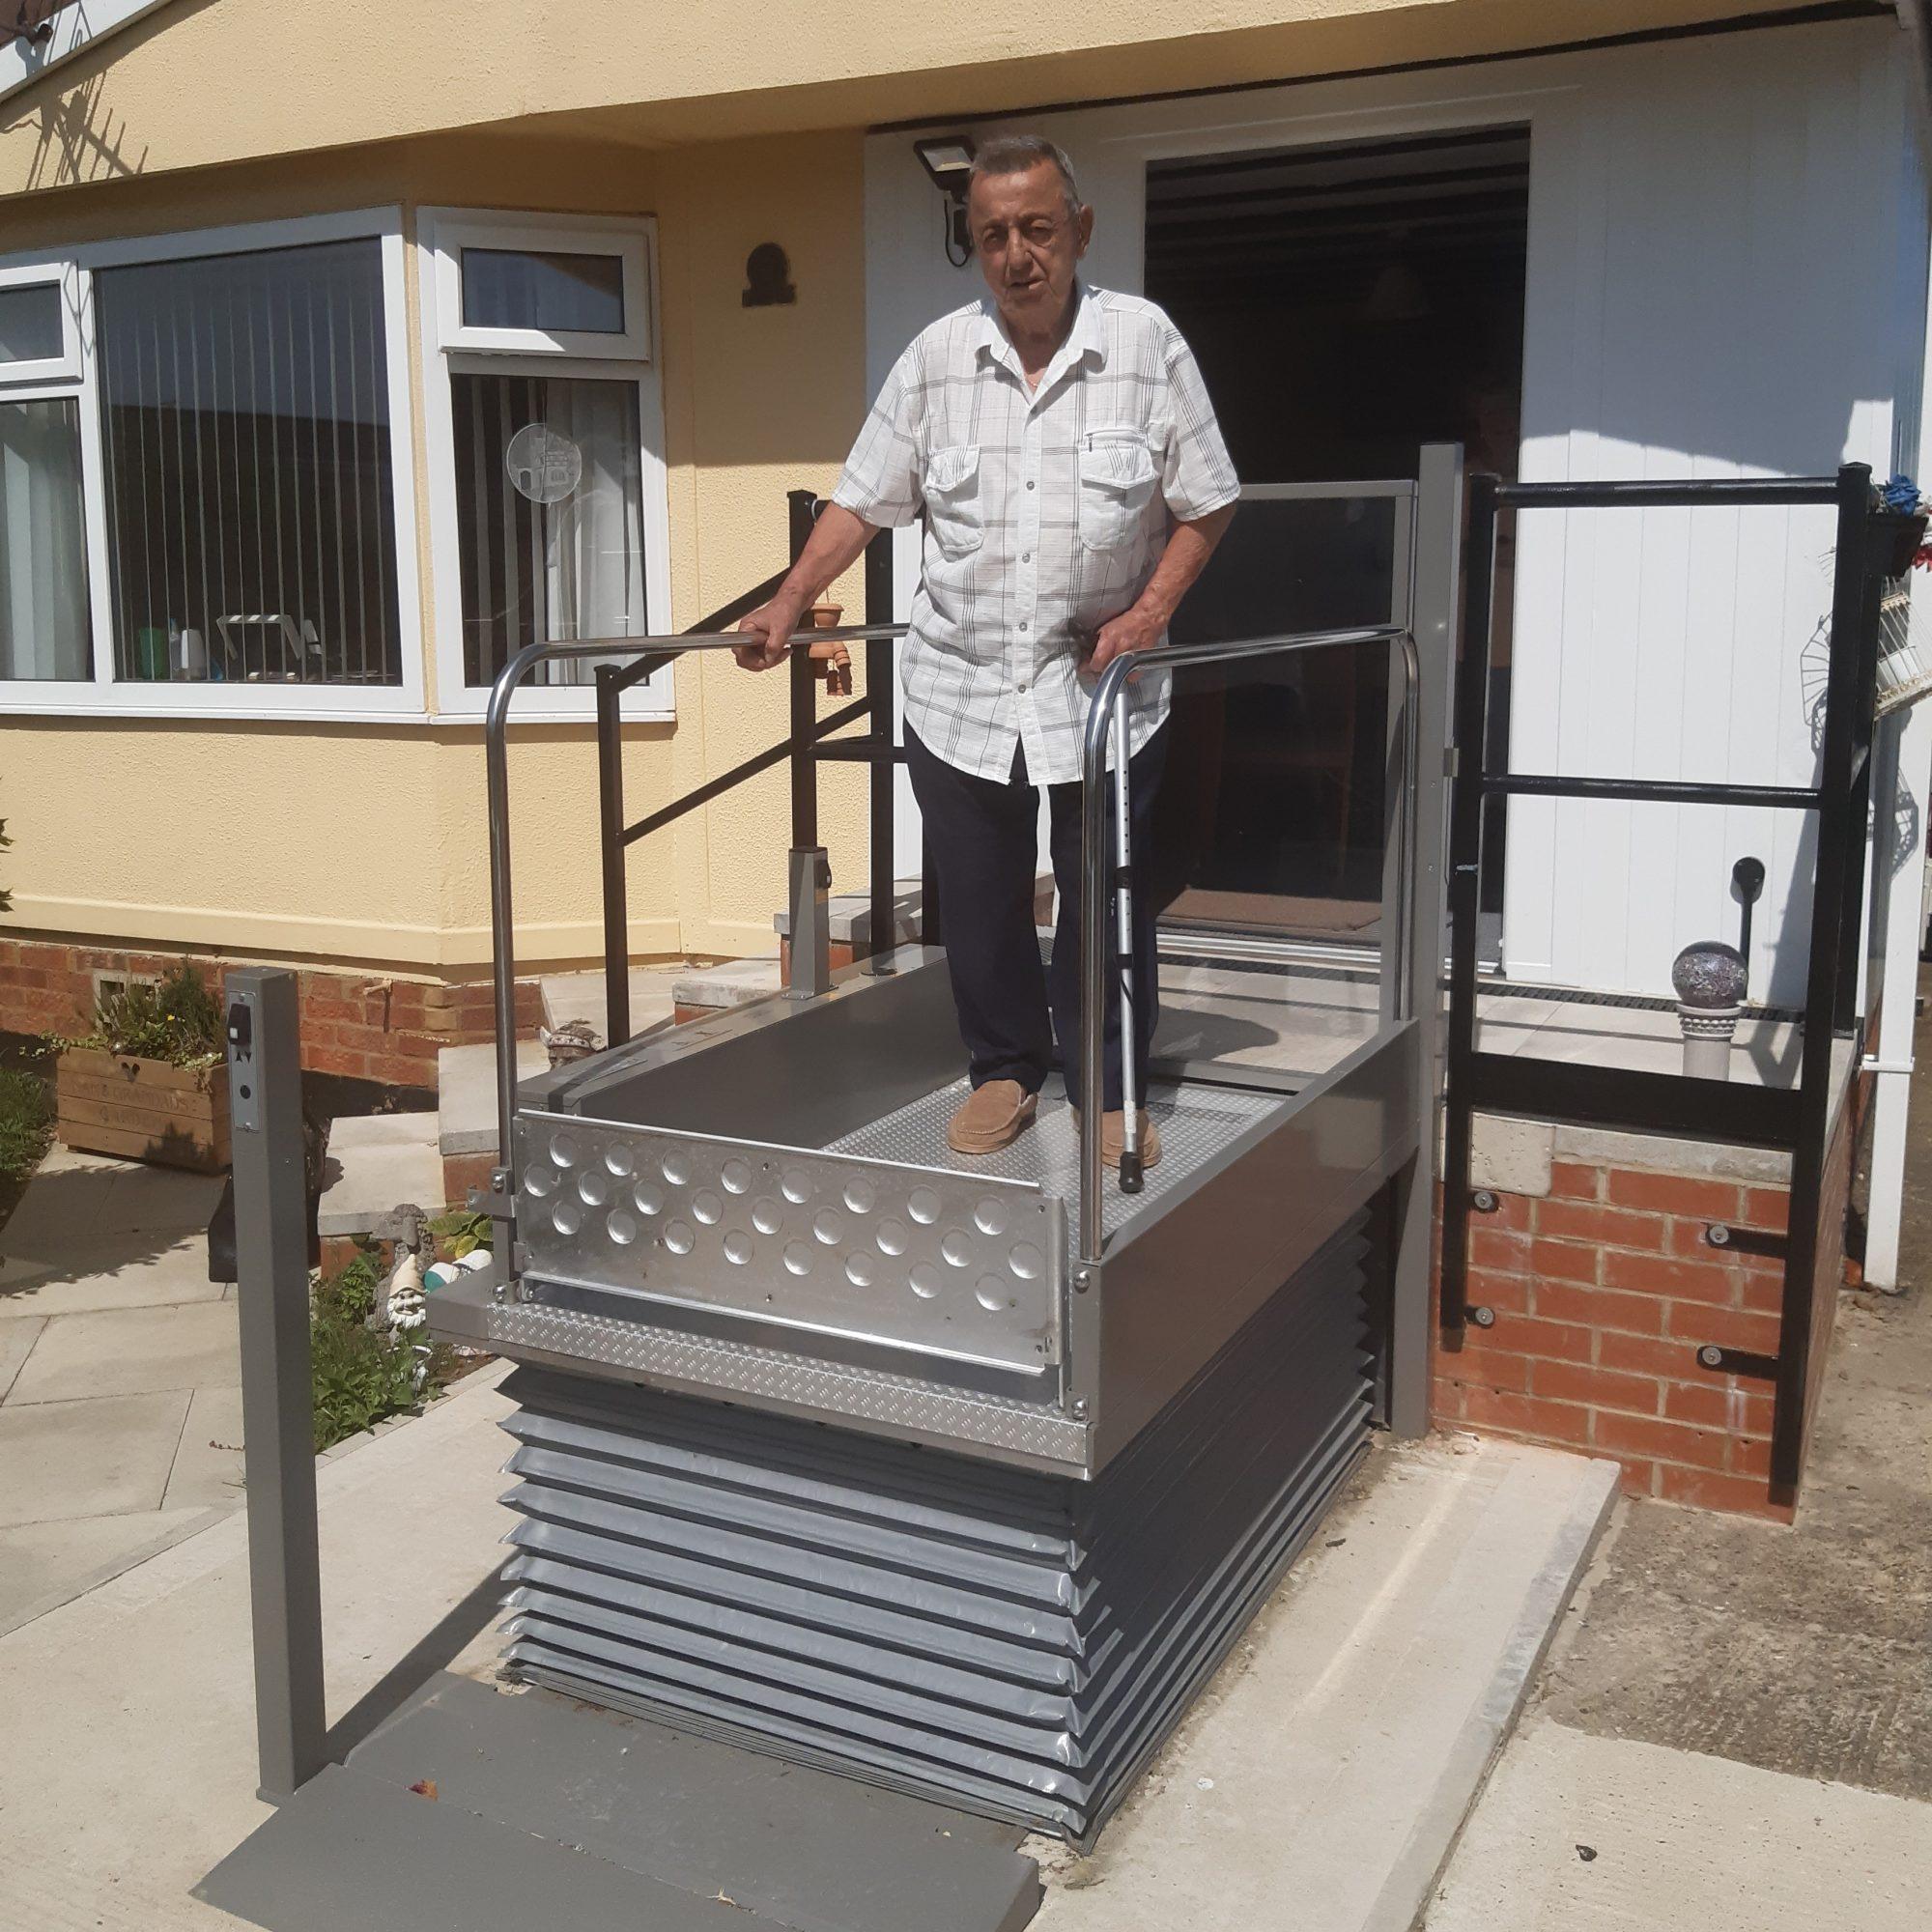 Mr B on new hydraulic lift